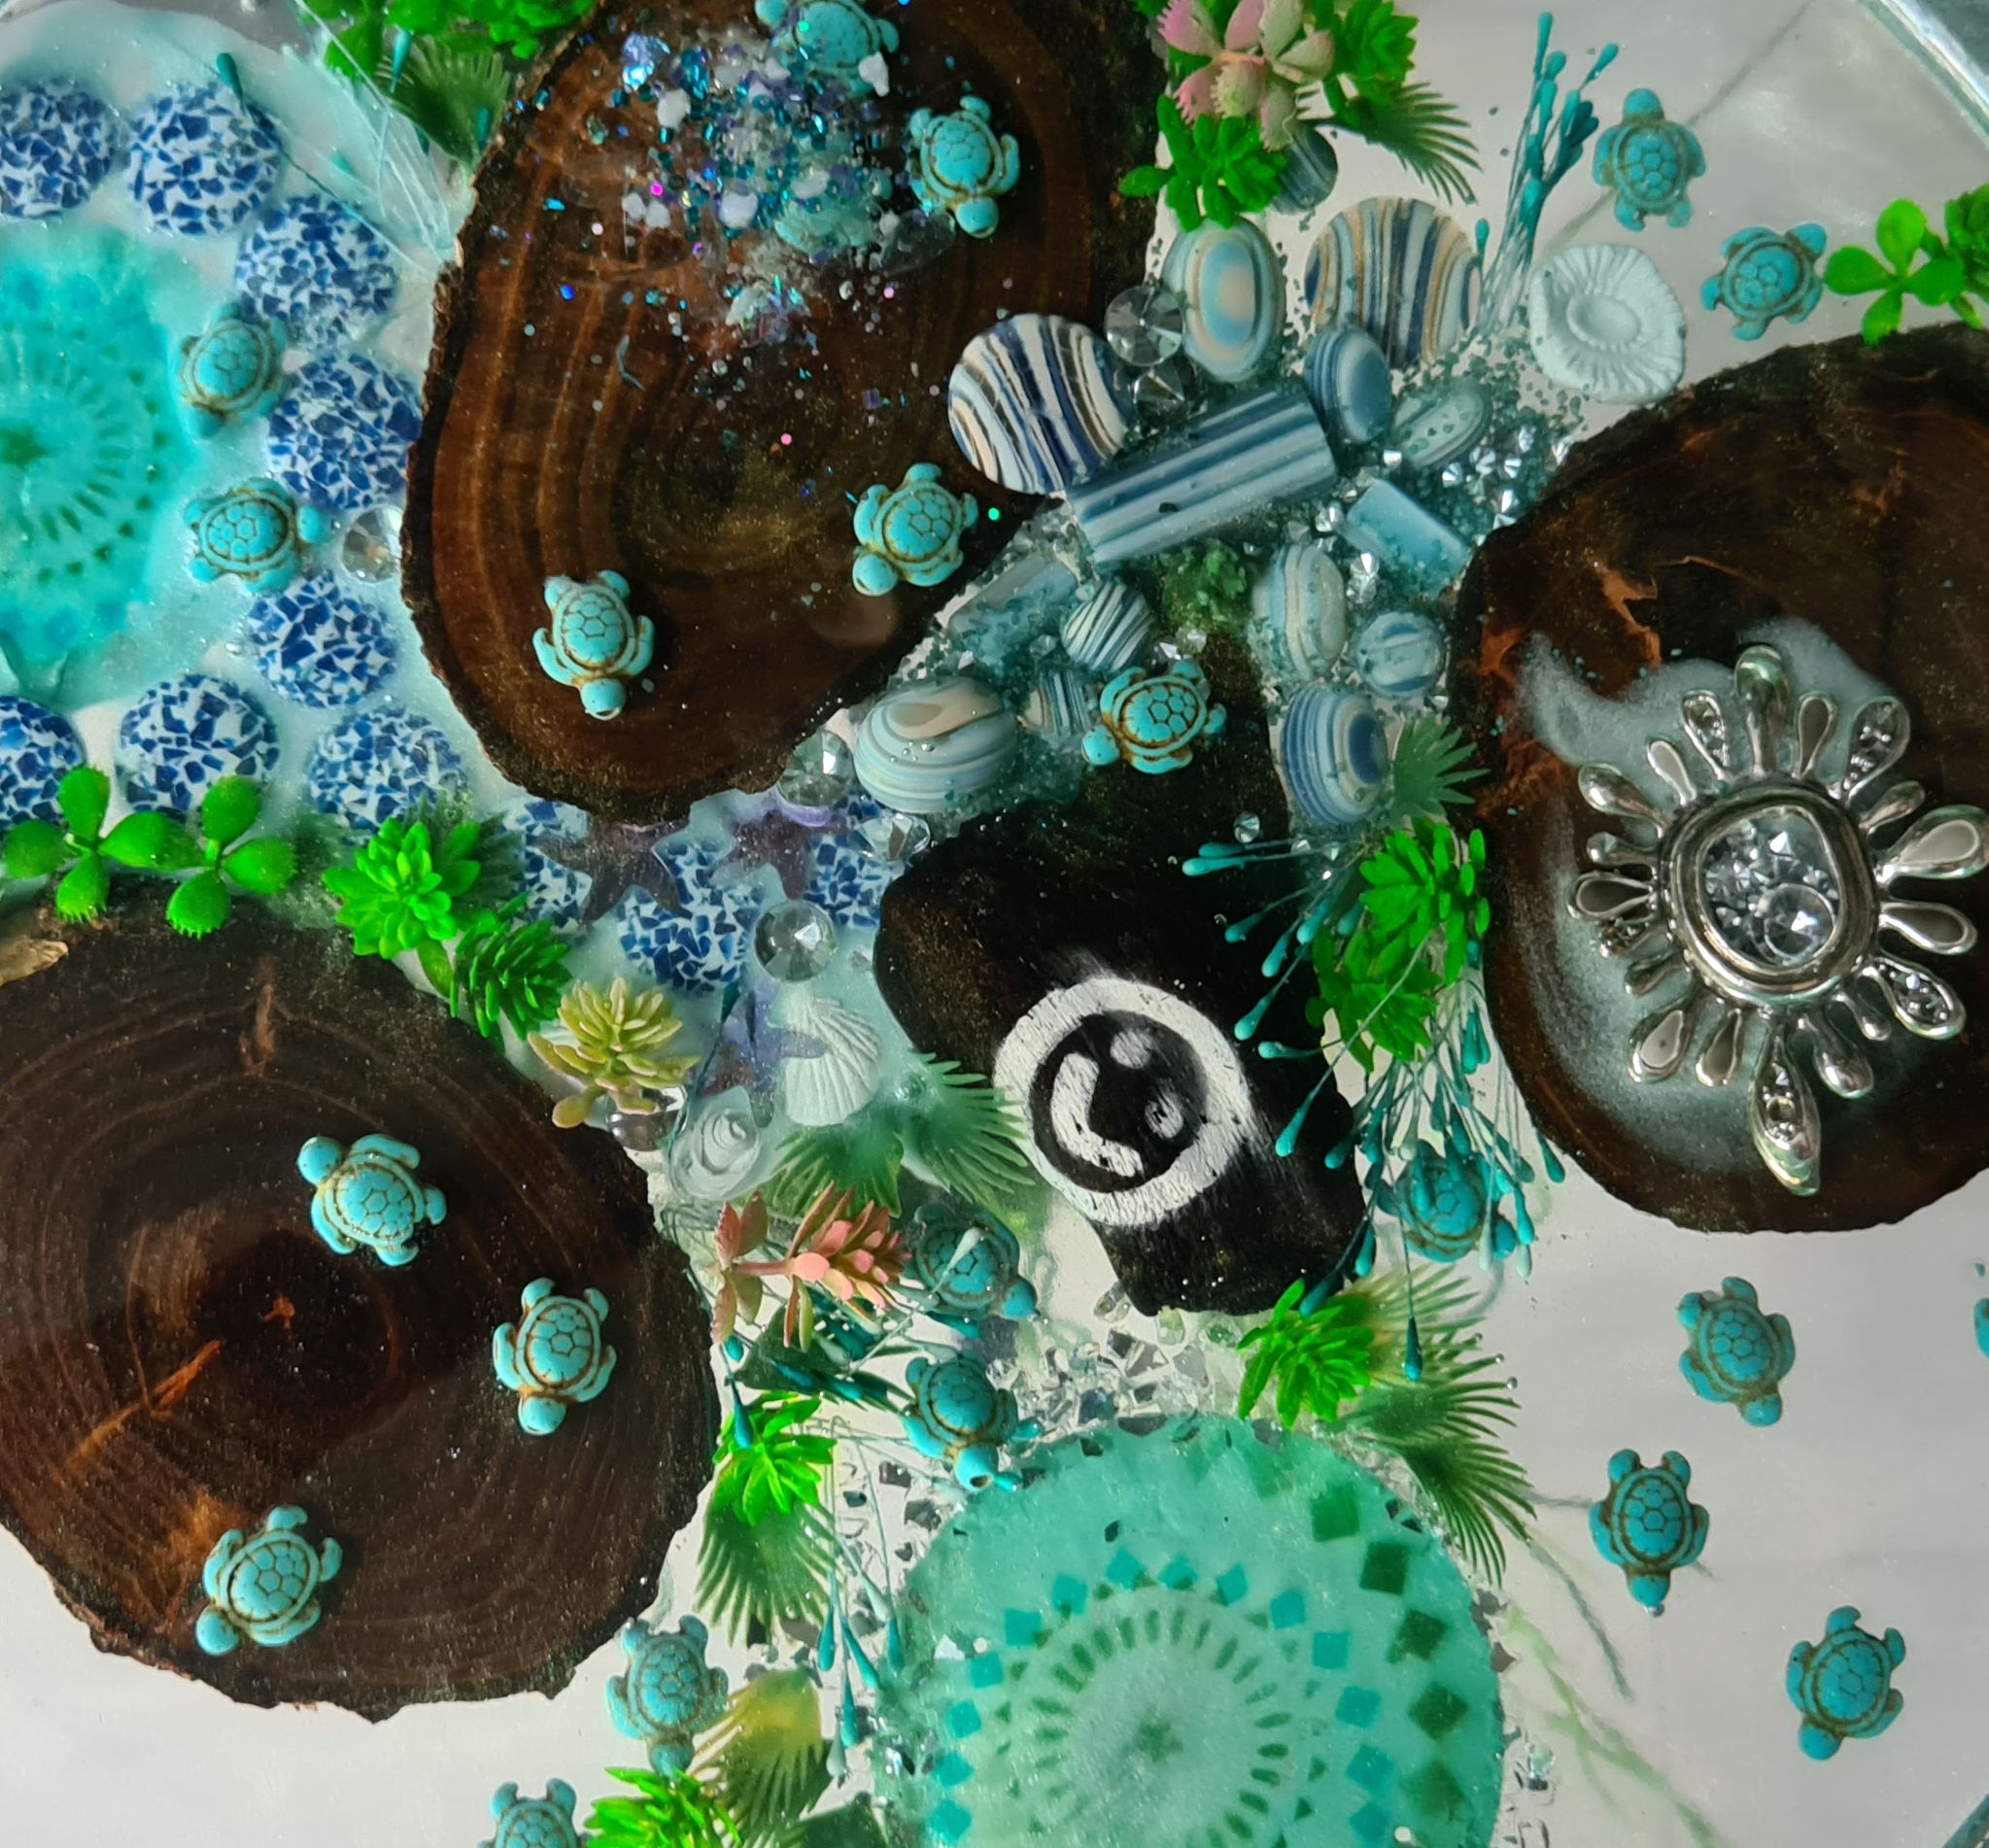 Epoxy tafel rond met schildpadden detail epoxyworkshop antoynette anema